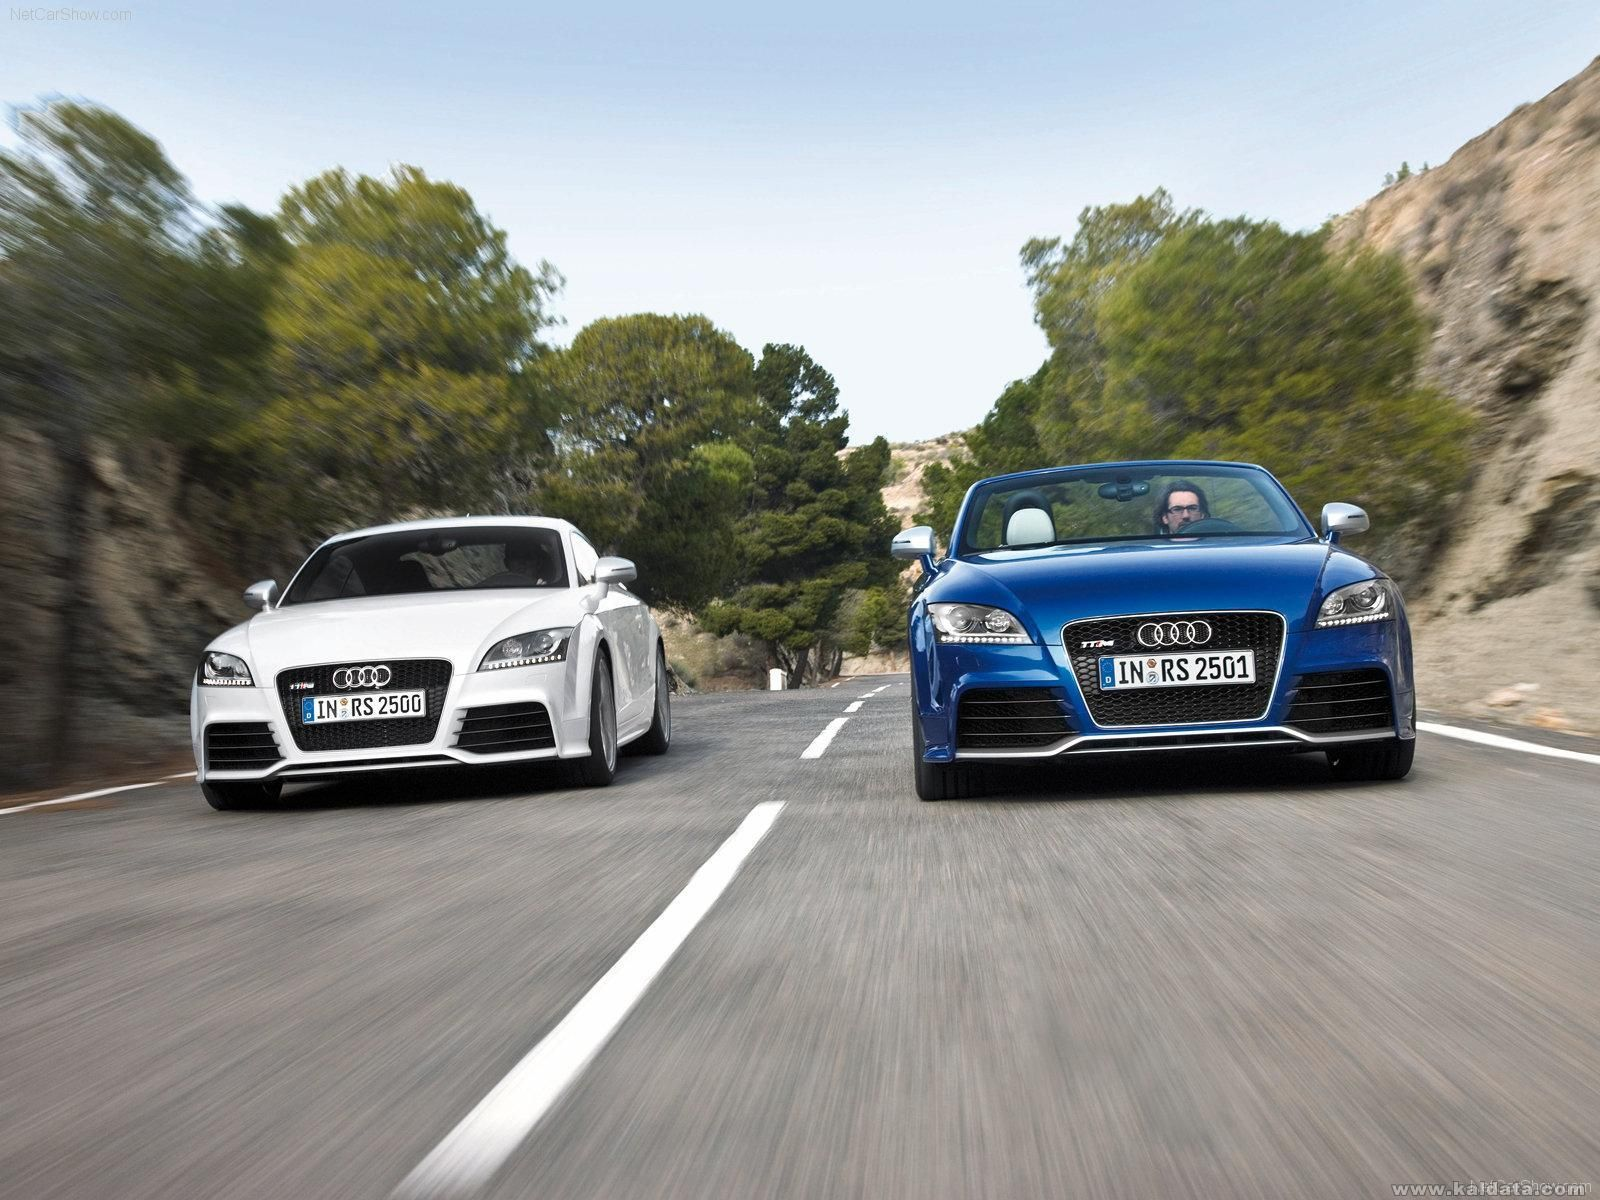 Audi-TT_RS_Roadster_2010_1600x1200_wallpaper_06.jpg